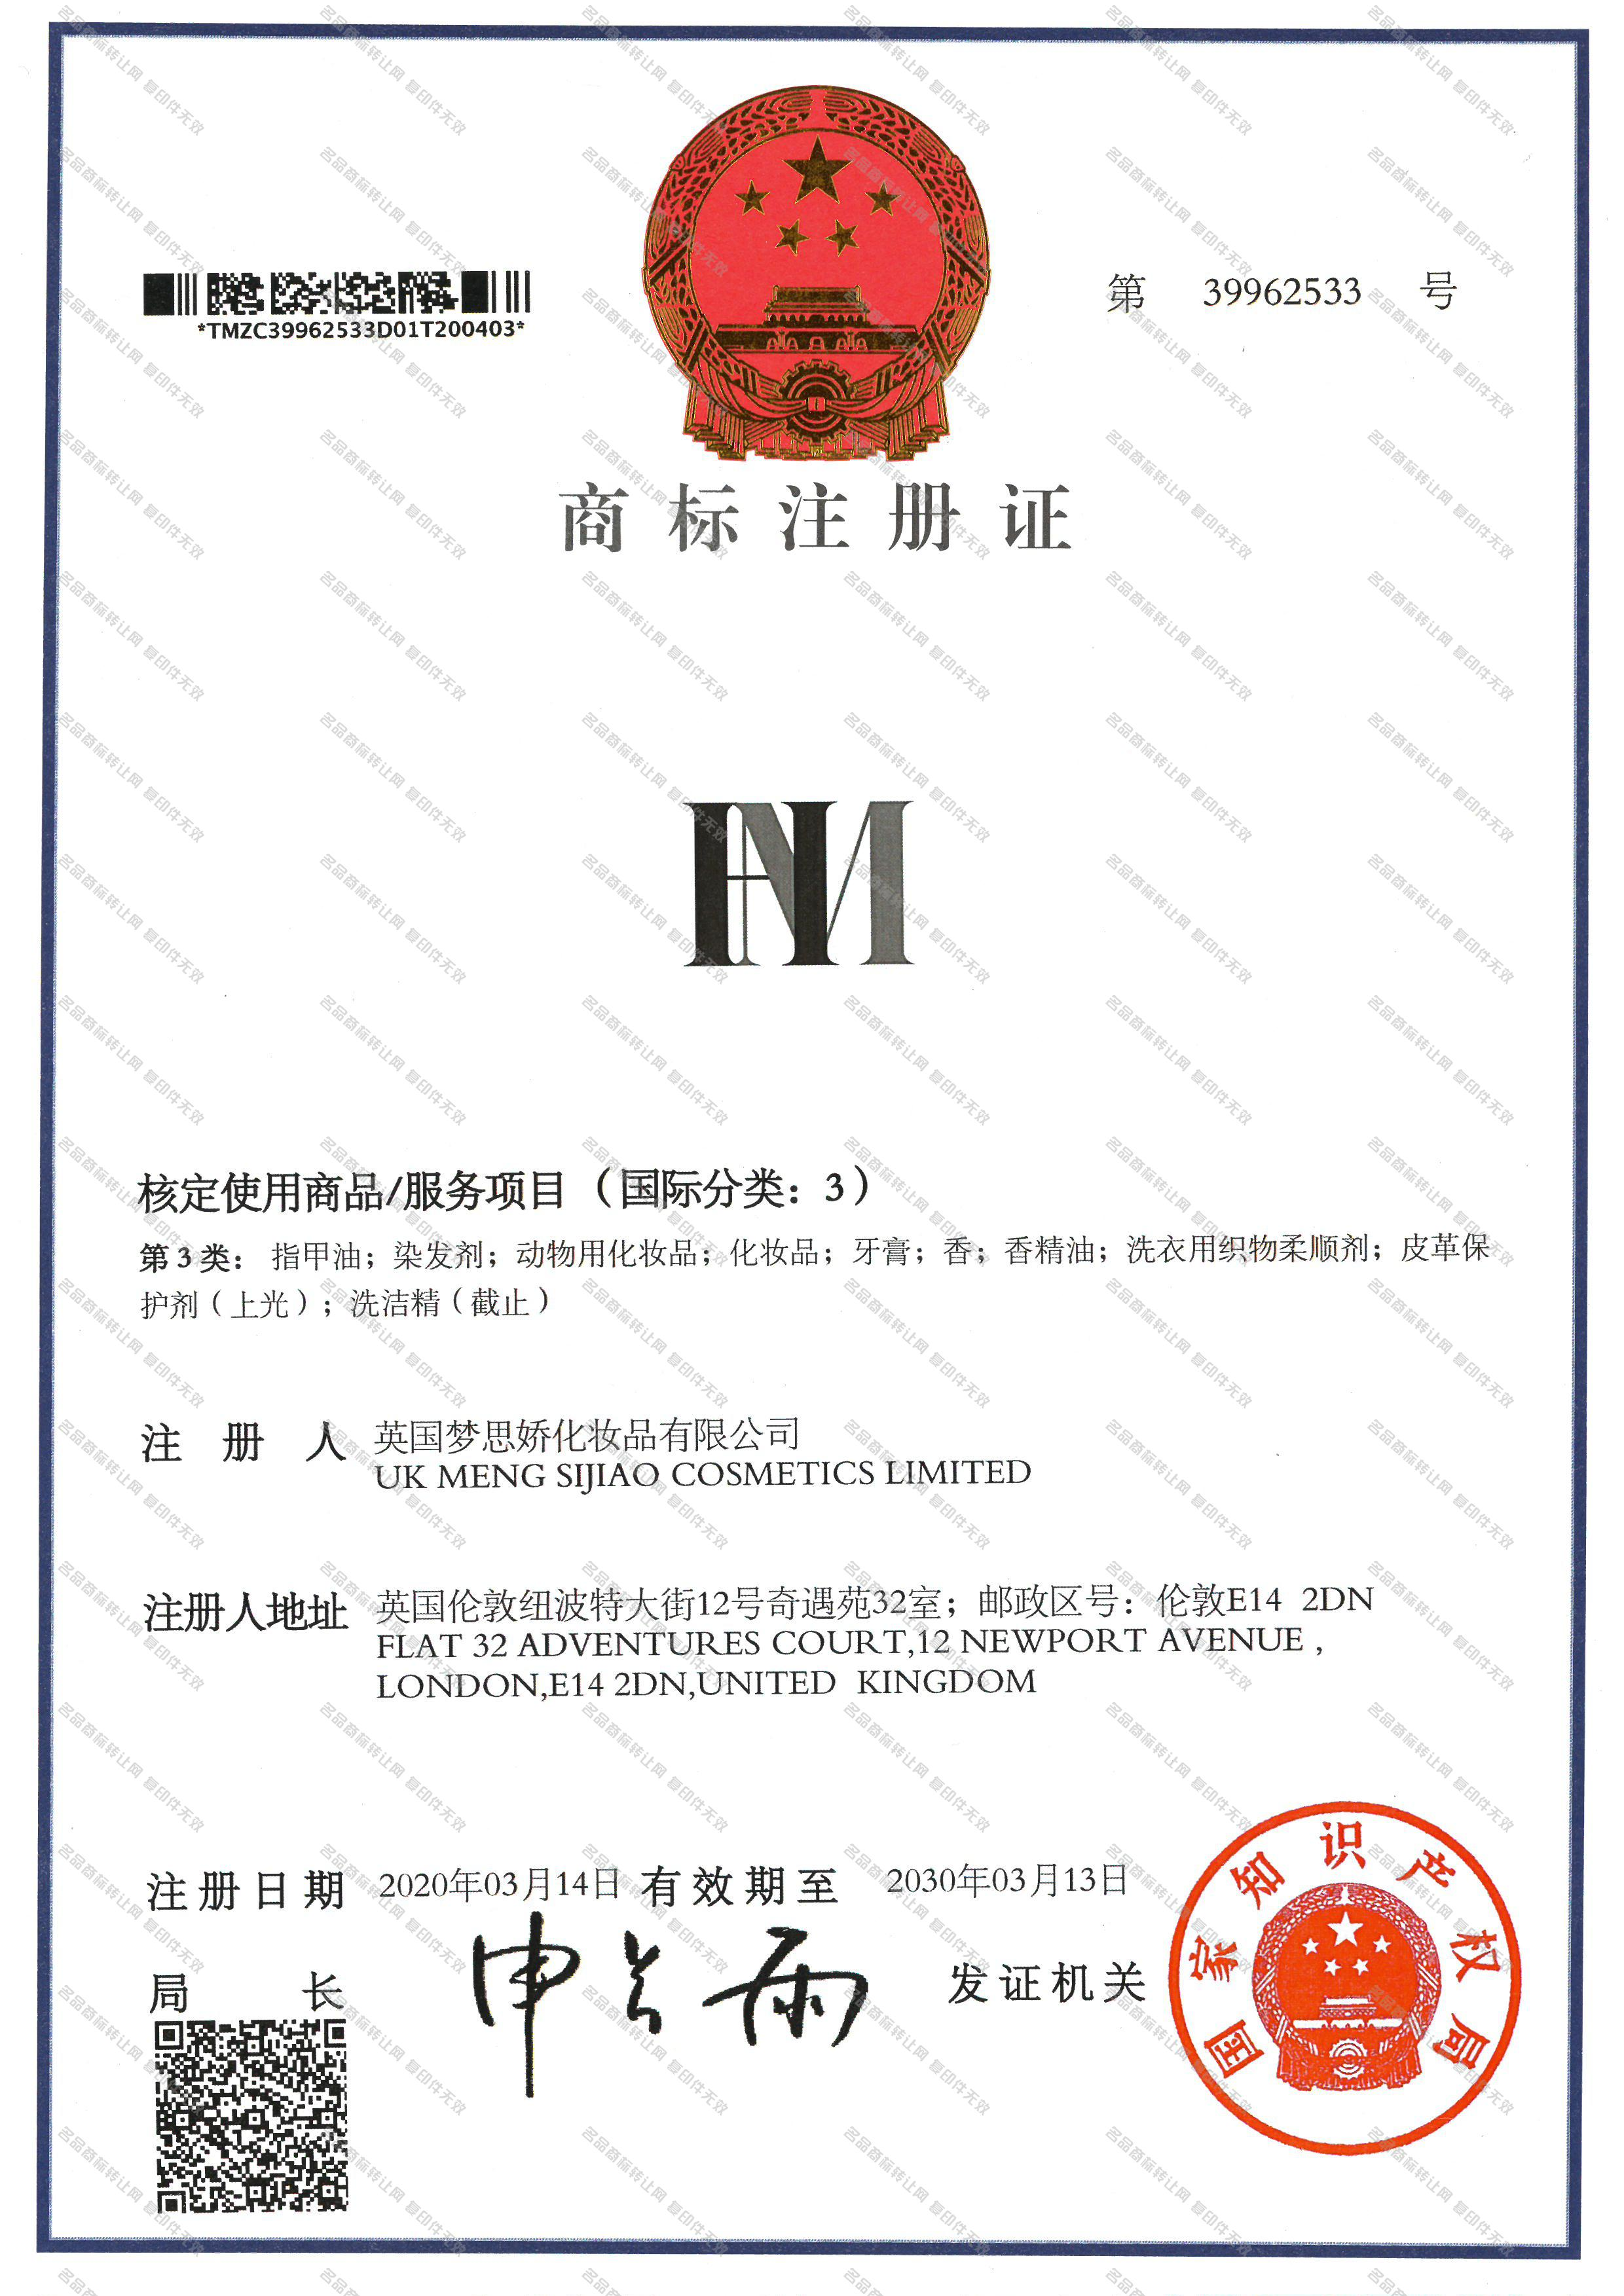 HM注册证